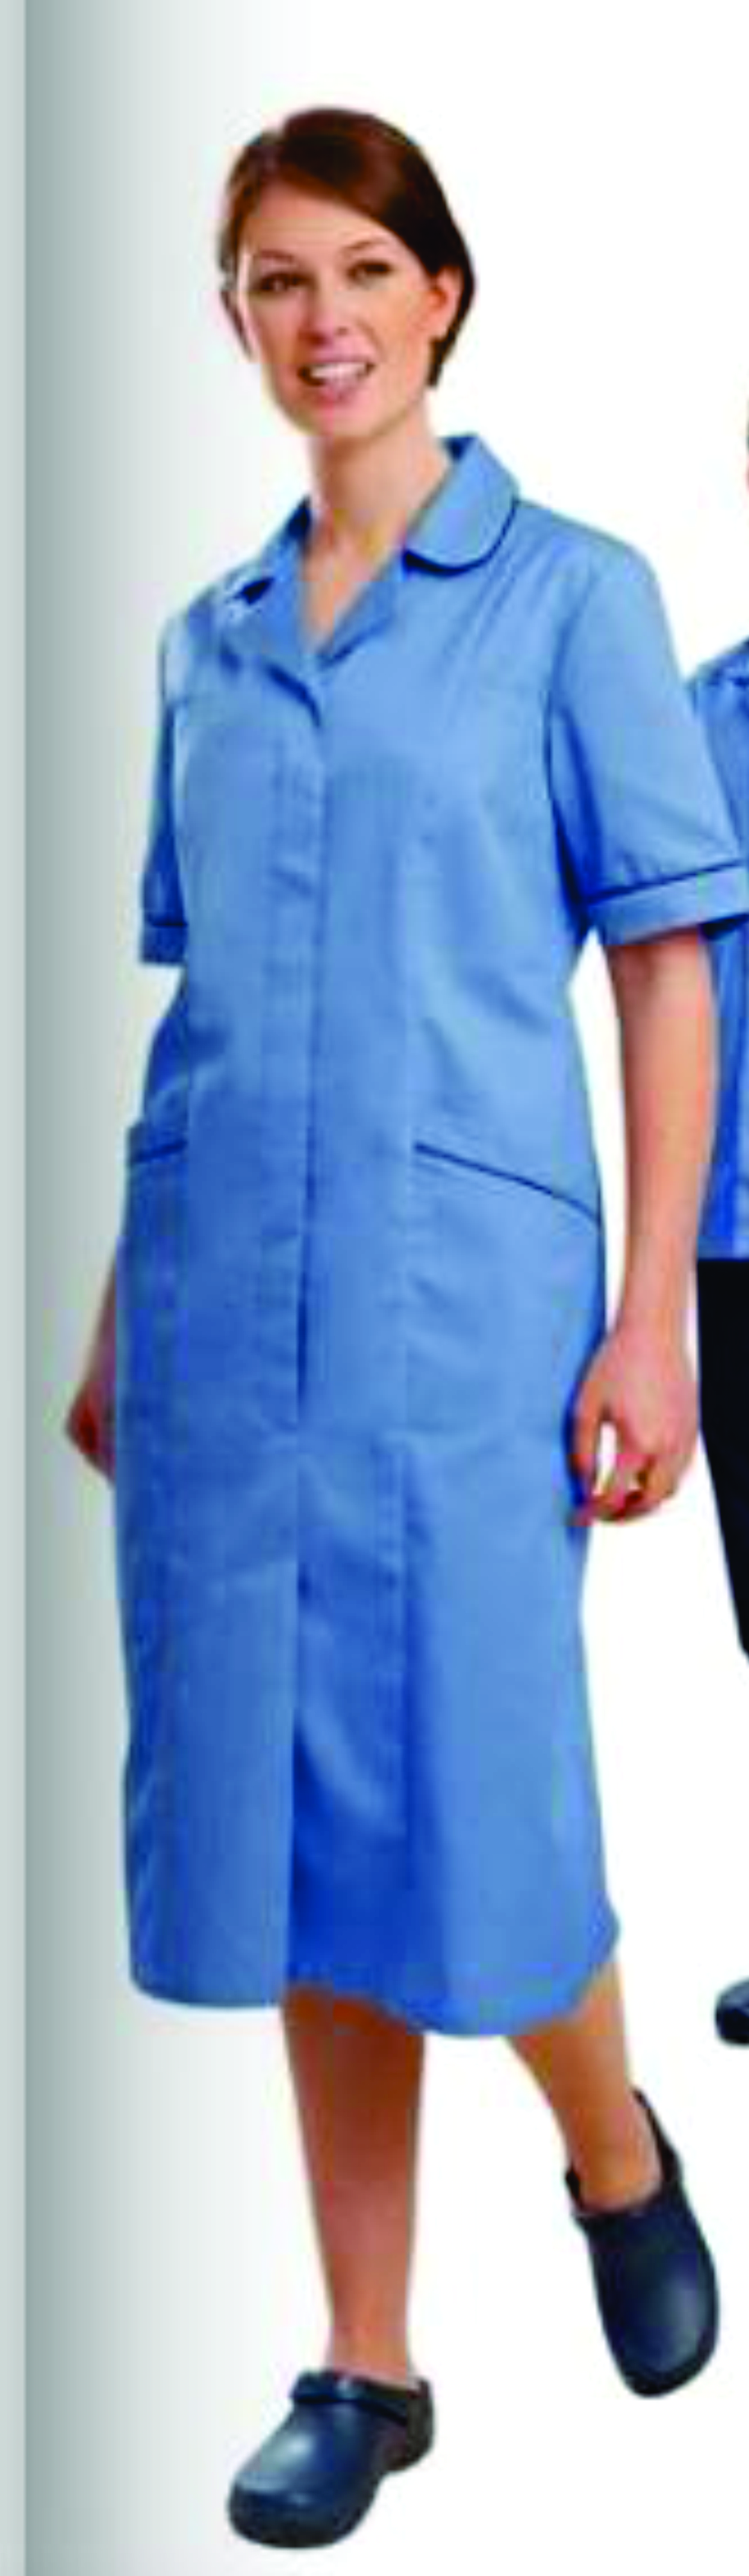 Nurse Tunics 06